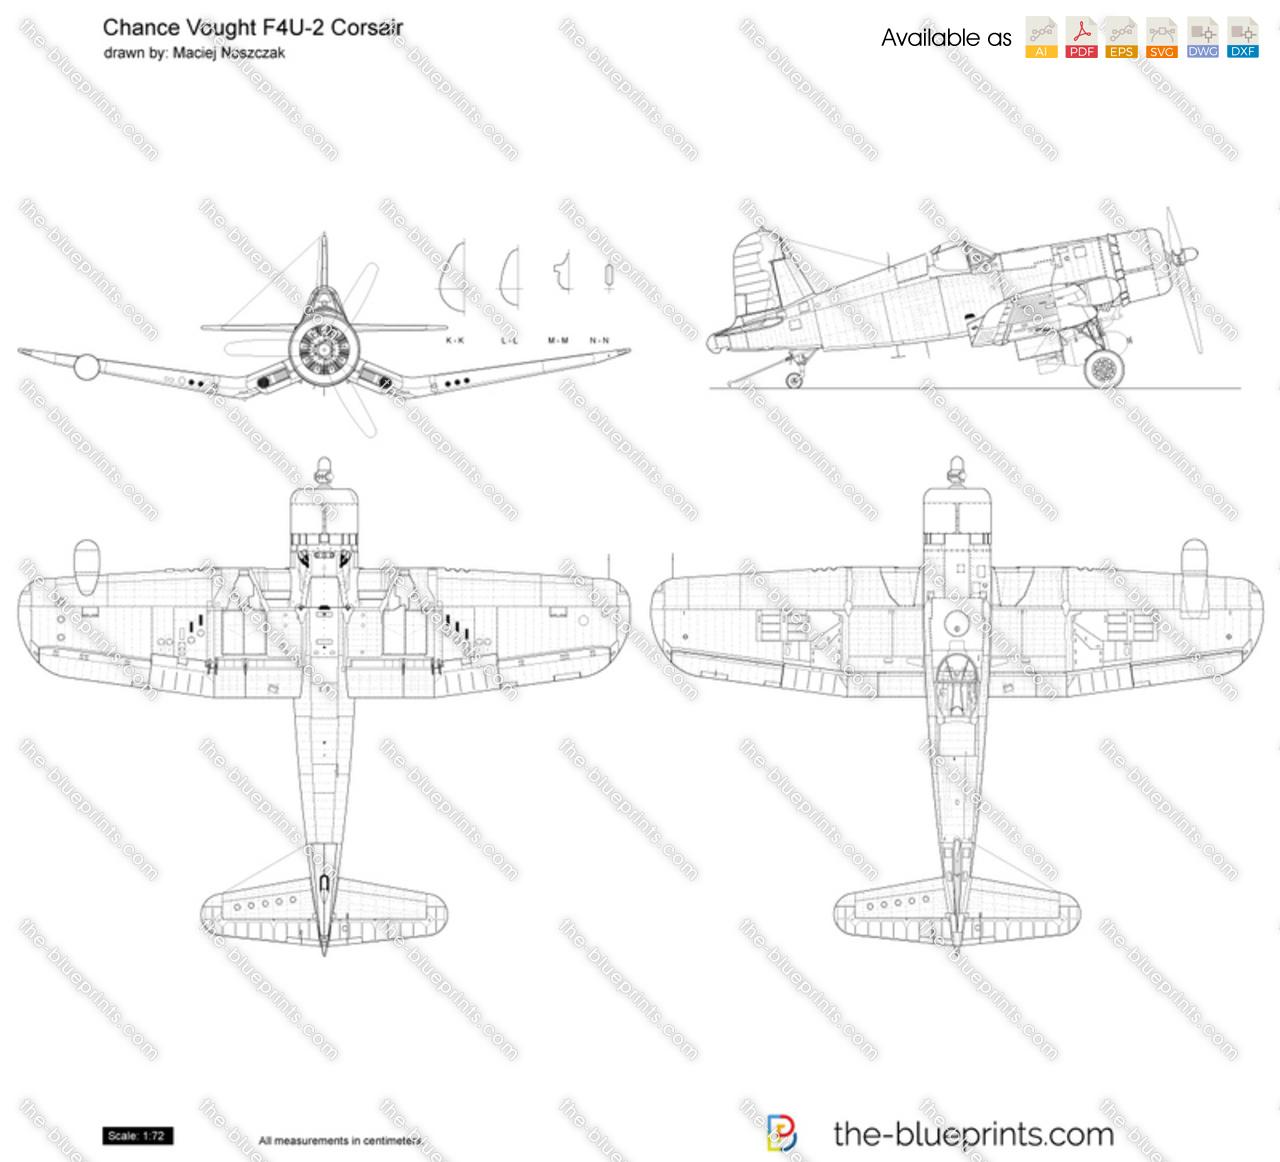 Chance Vought F4U-2 Corsair